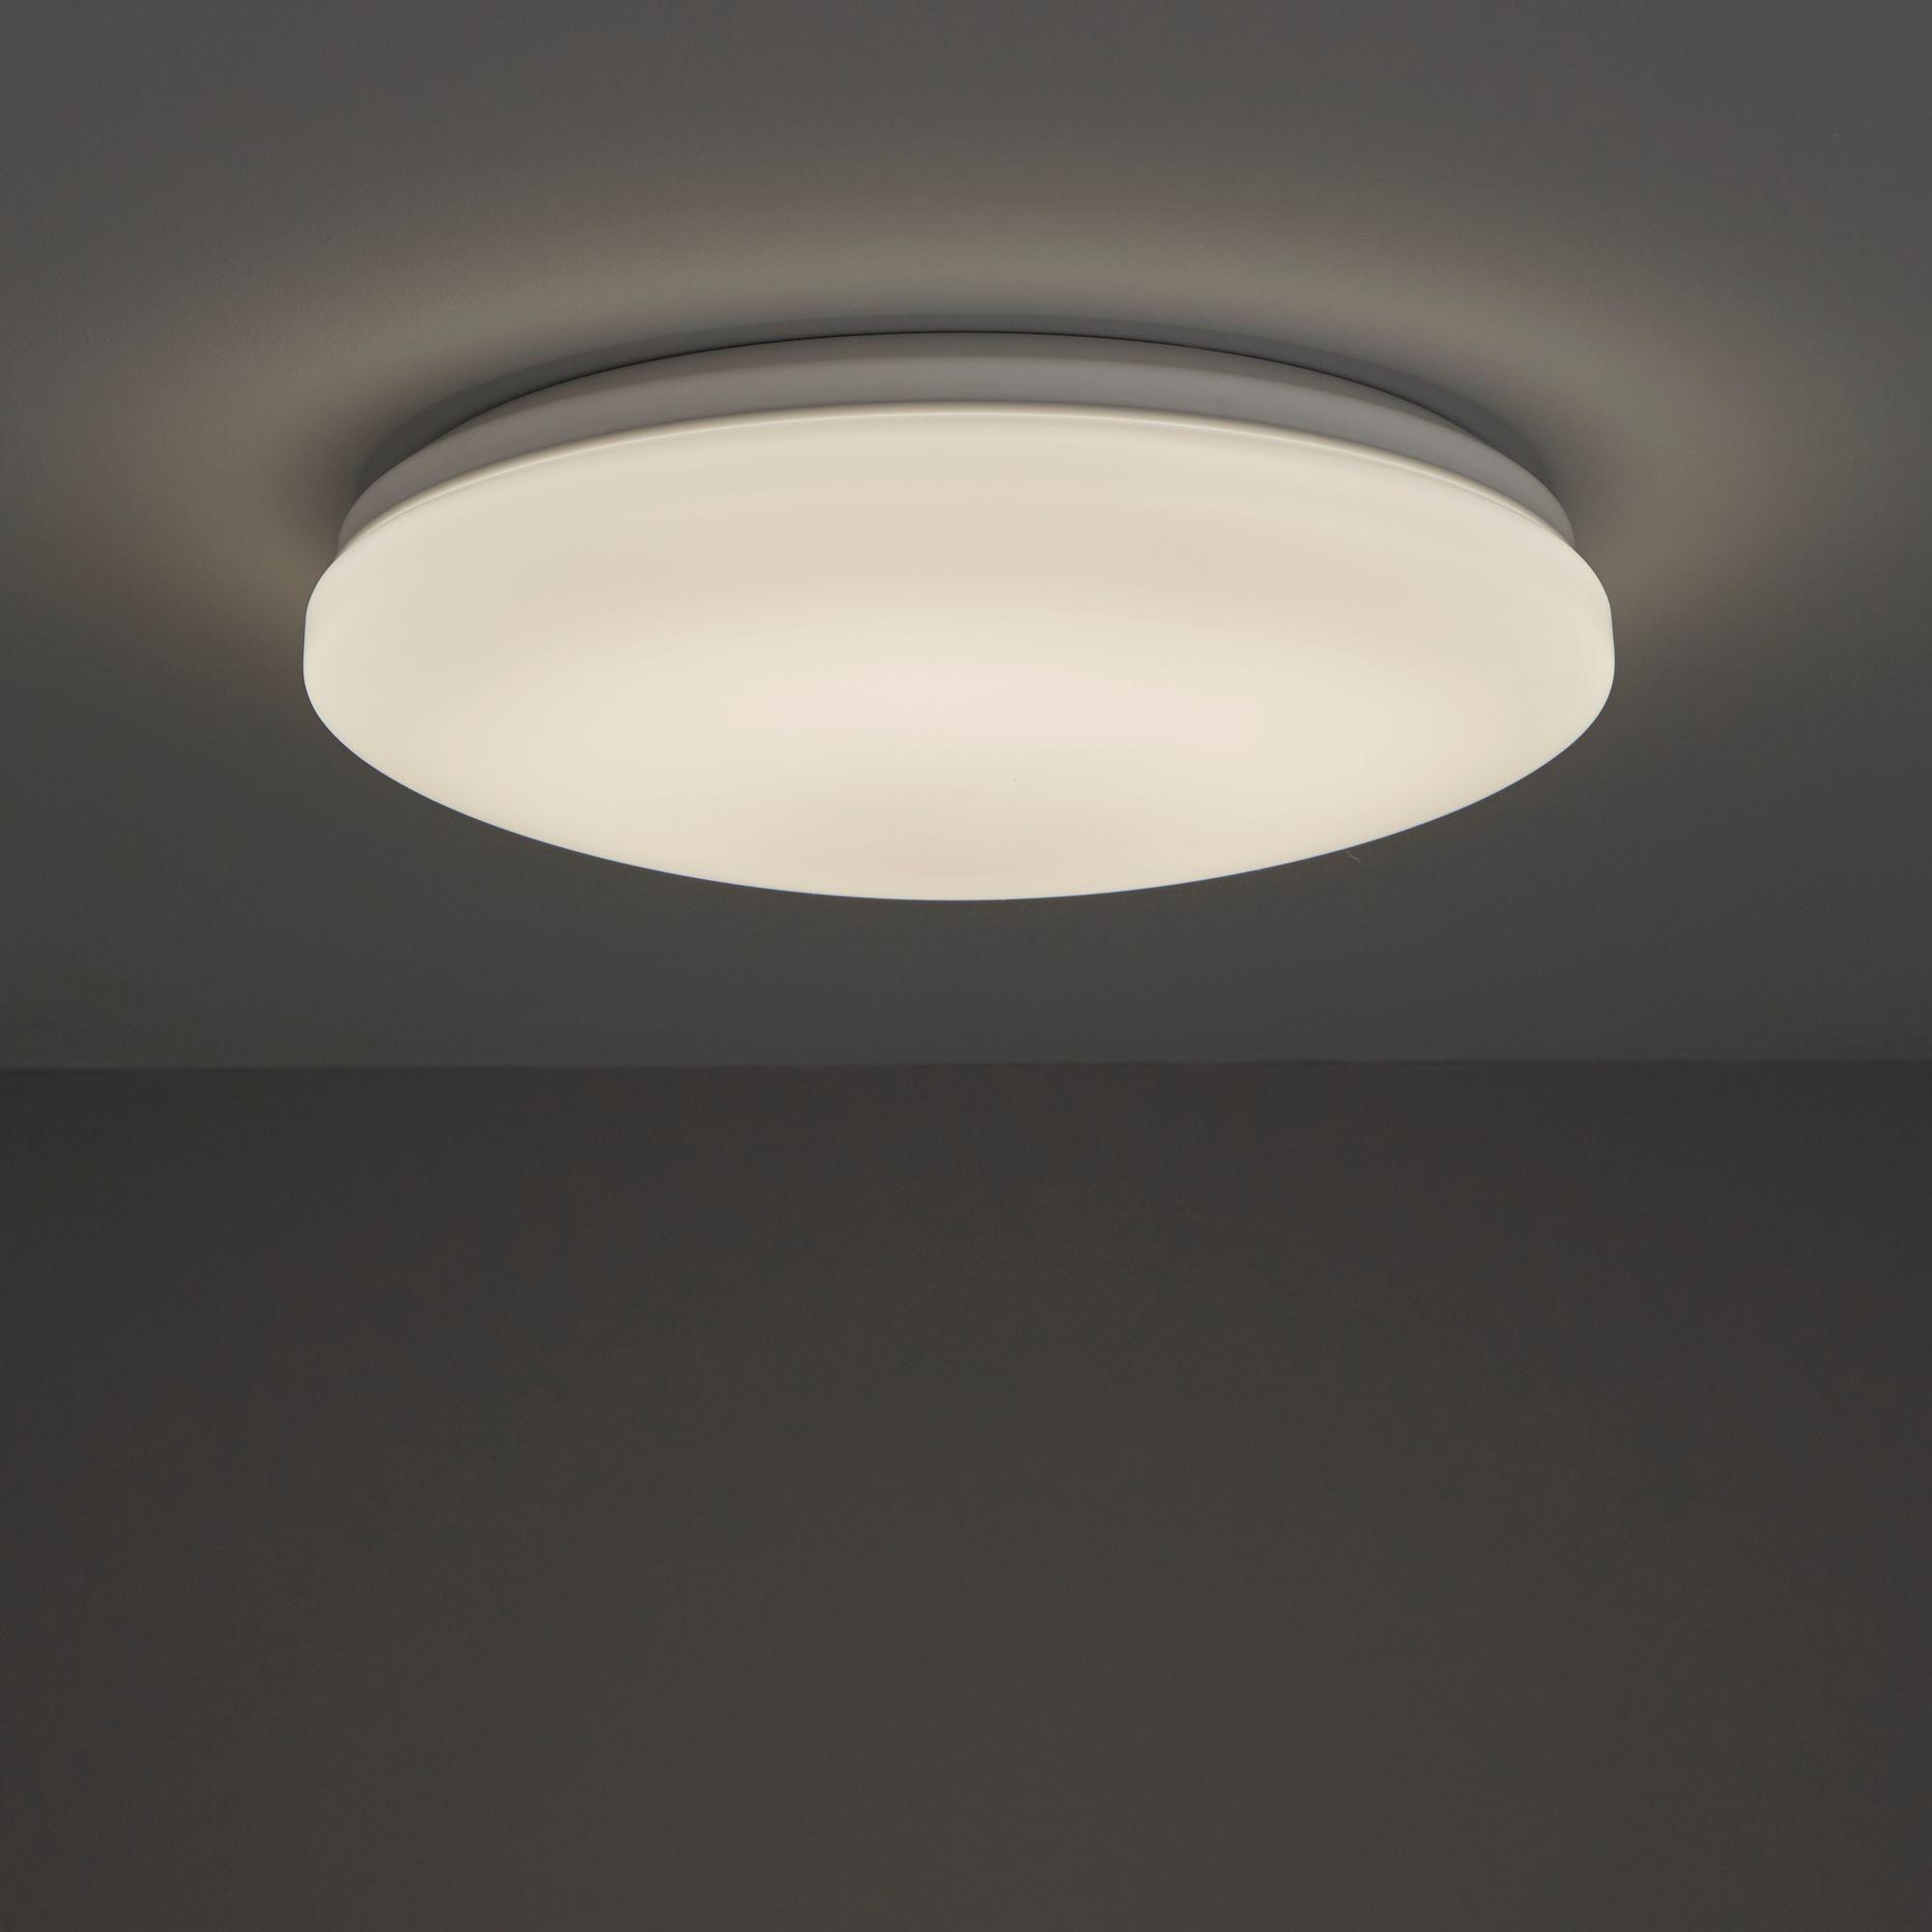 White pir sensor ceiling light departments diy at bq white pir sensor ceiling light departments diy at bq aloadofball Gallery